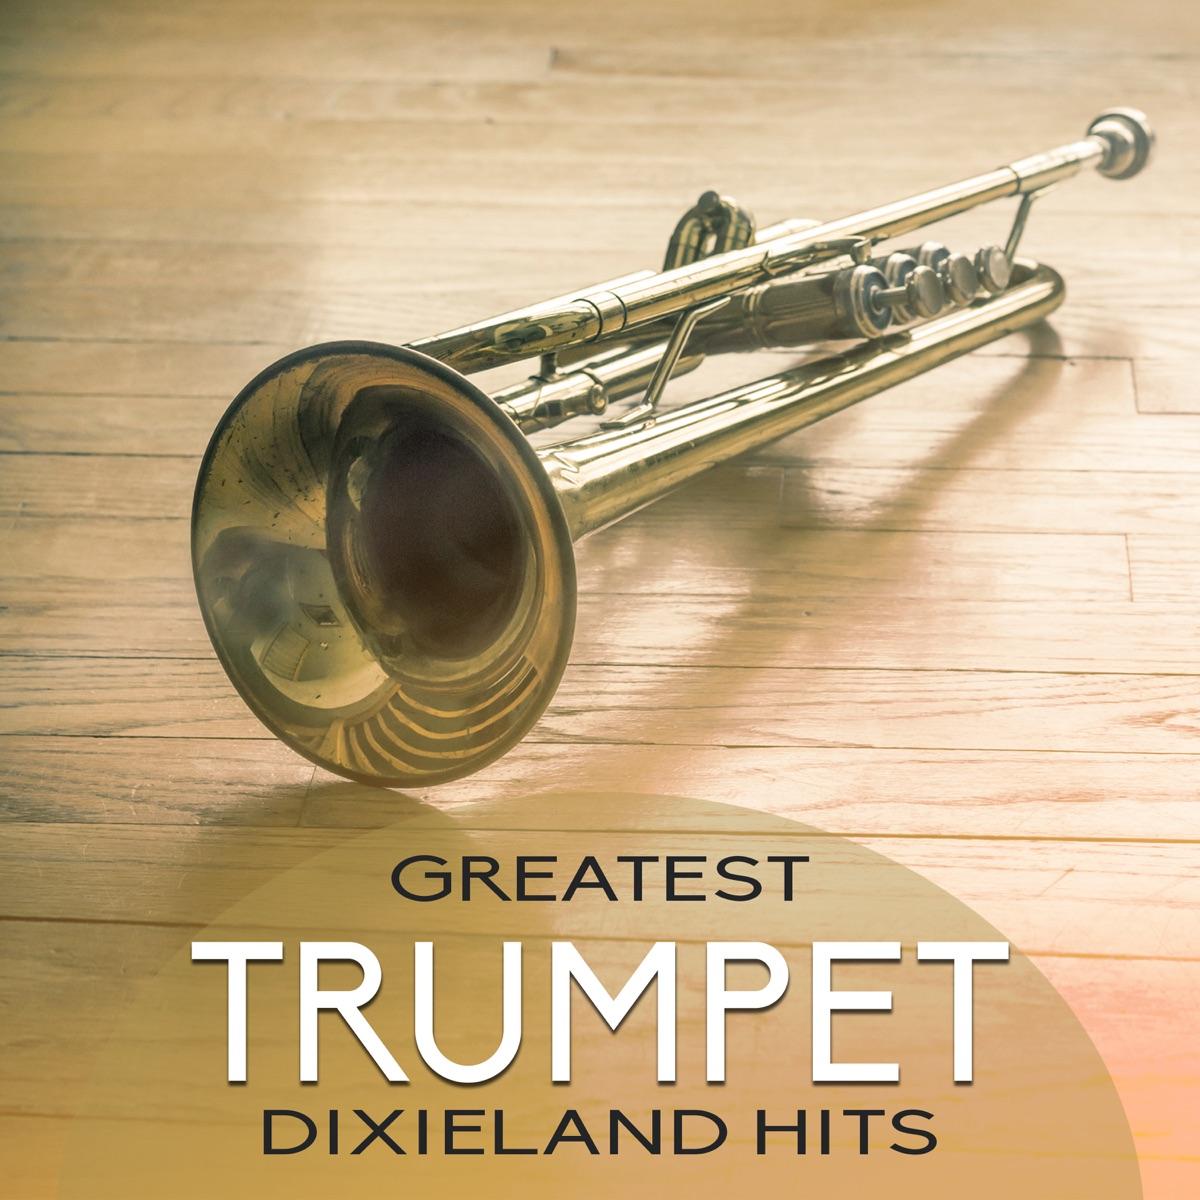 Greatest Trumpet Dixieland Hits: Golden Jazz Trumpet